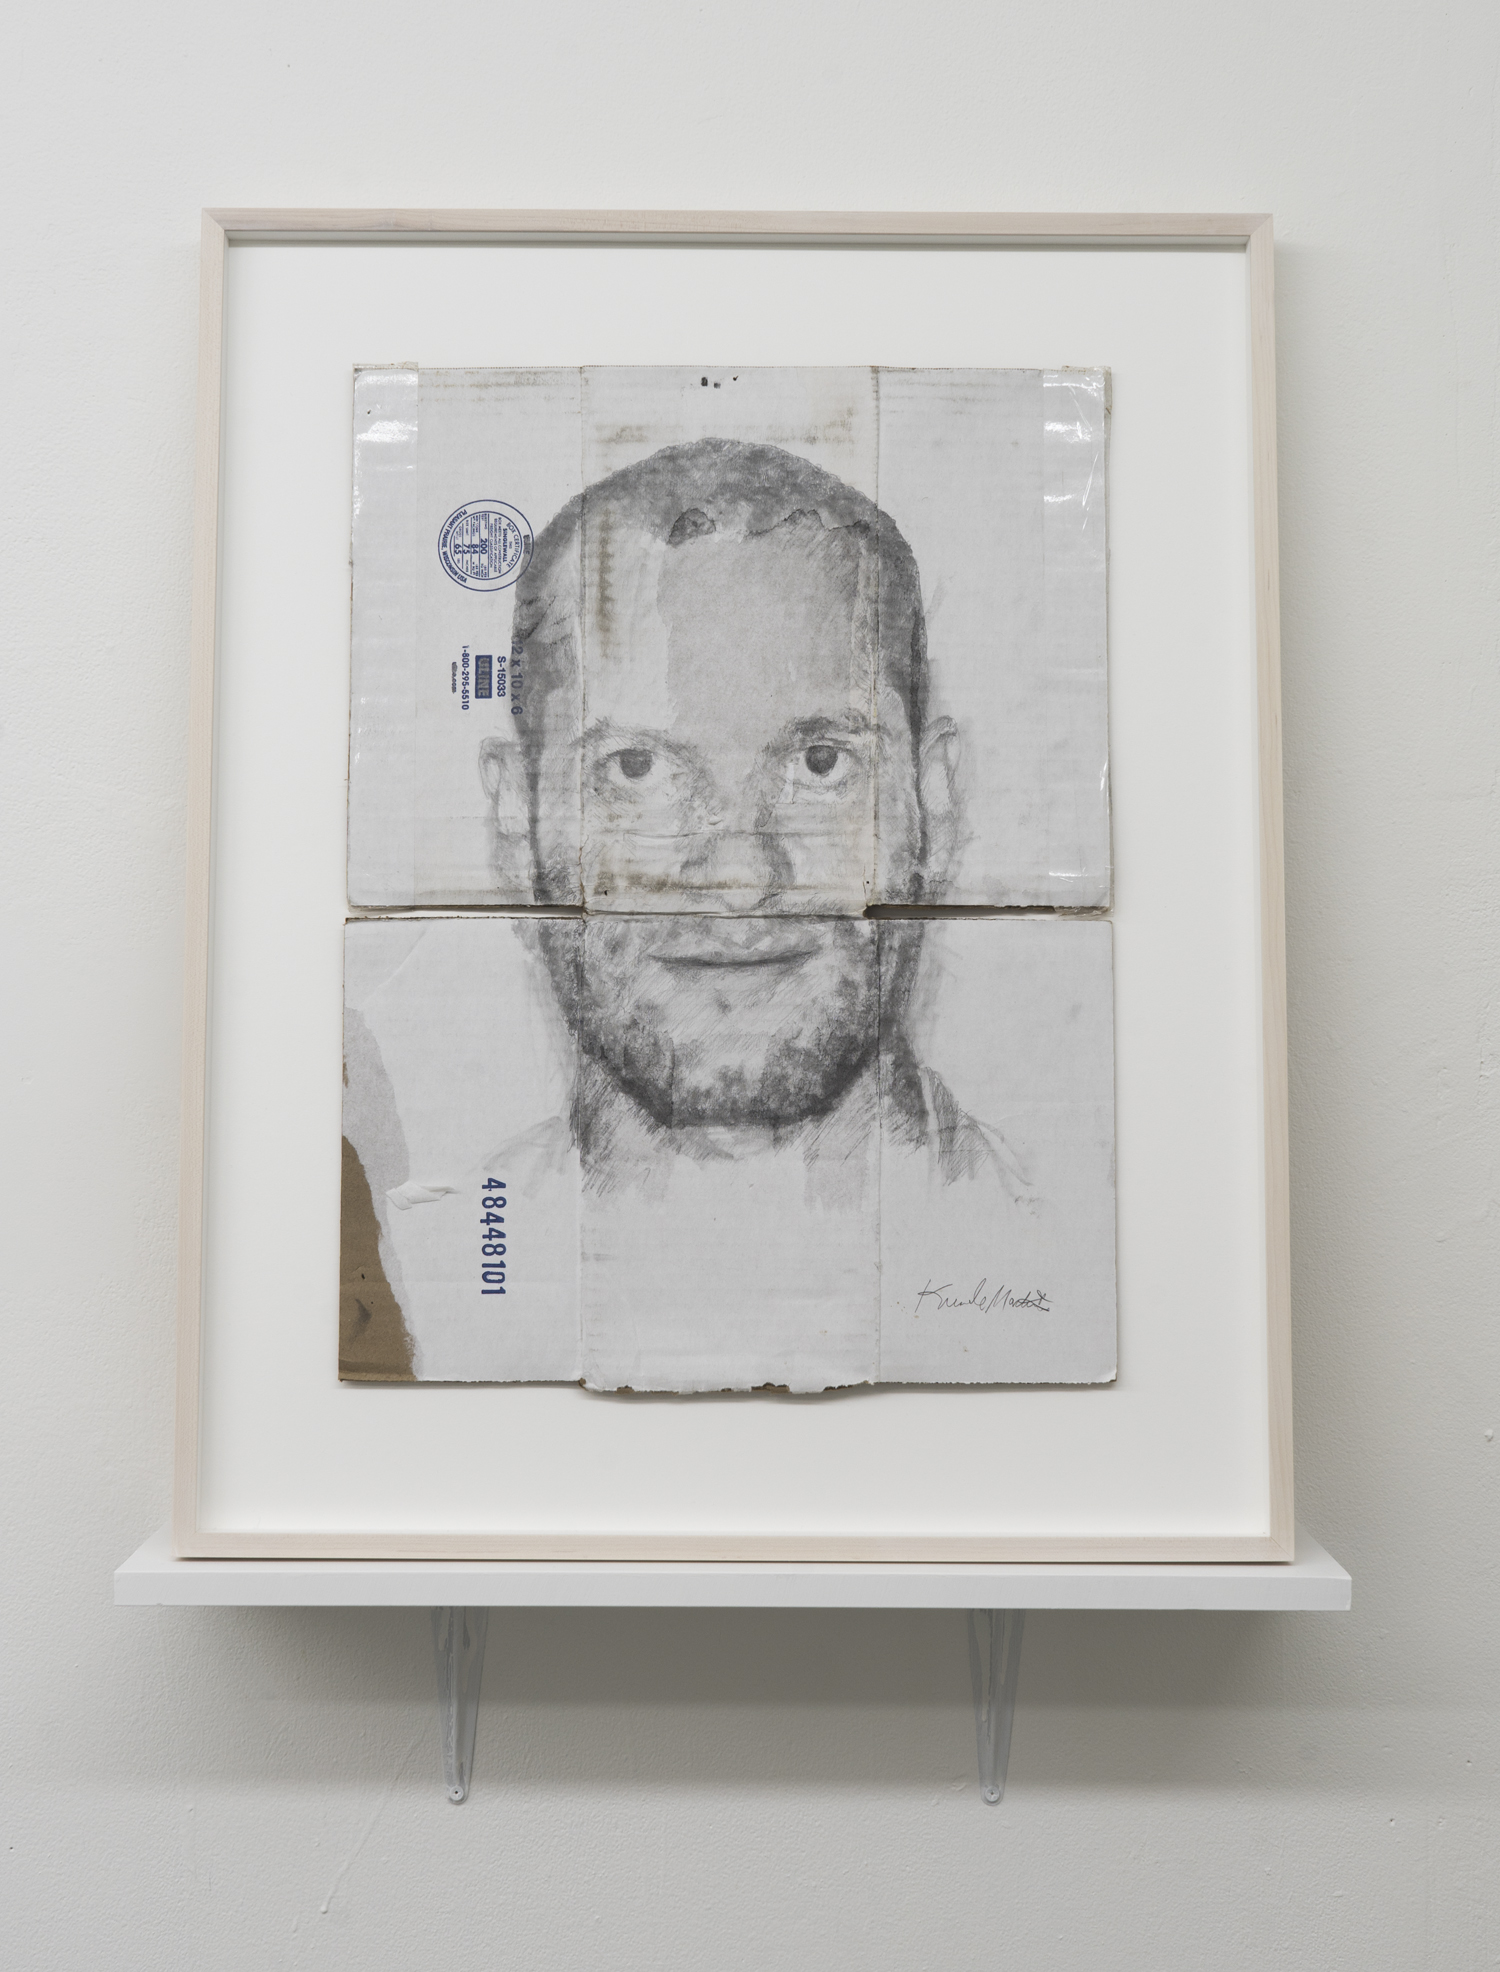 Kunle F. Martins,  A-Ron , 2018, pencil on found white cardboard box, 16 x 22 1/2 inches